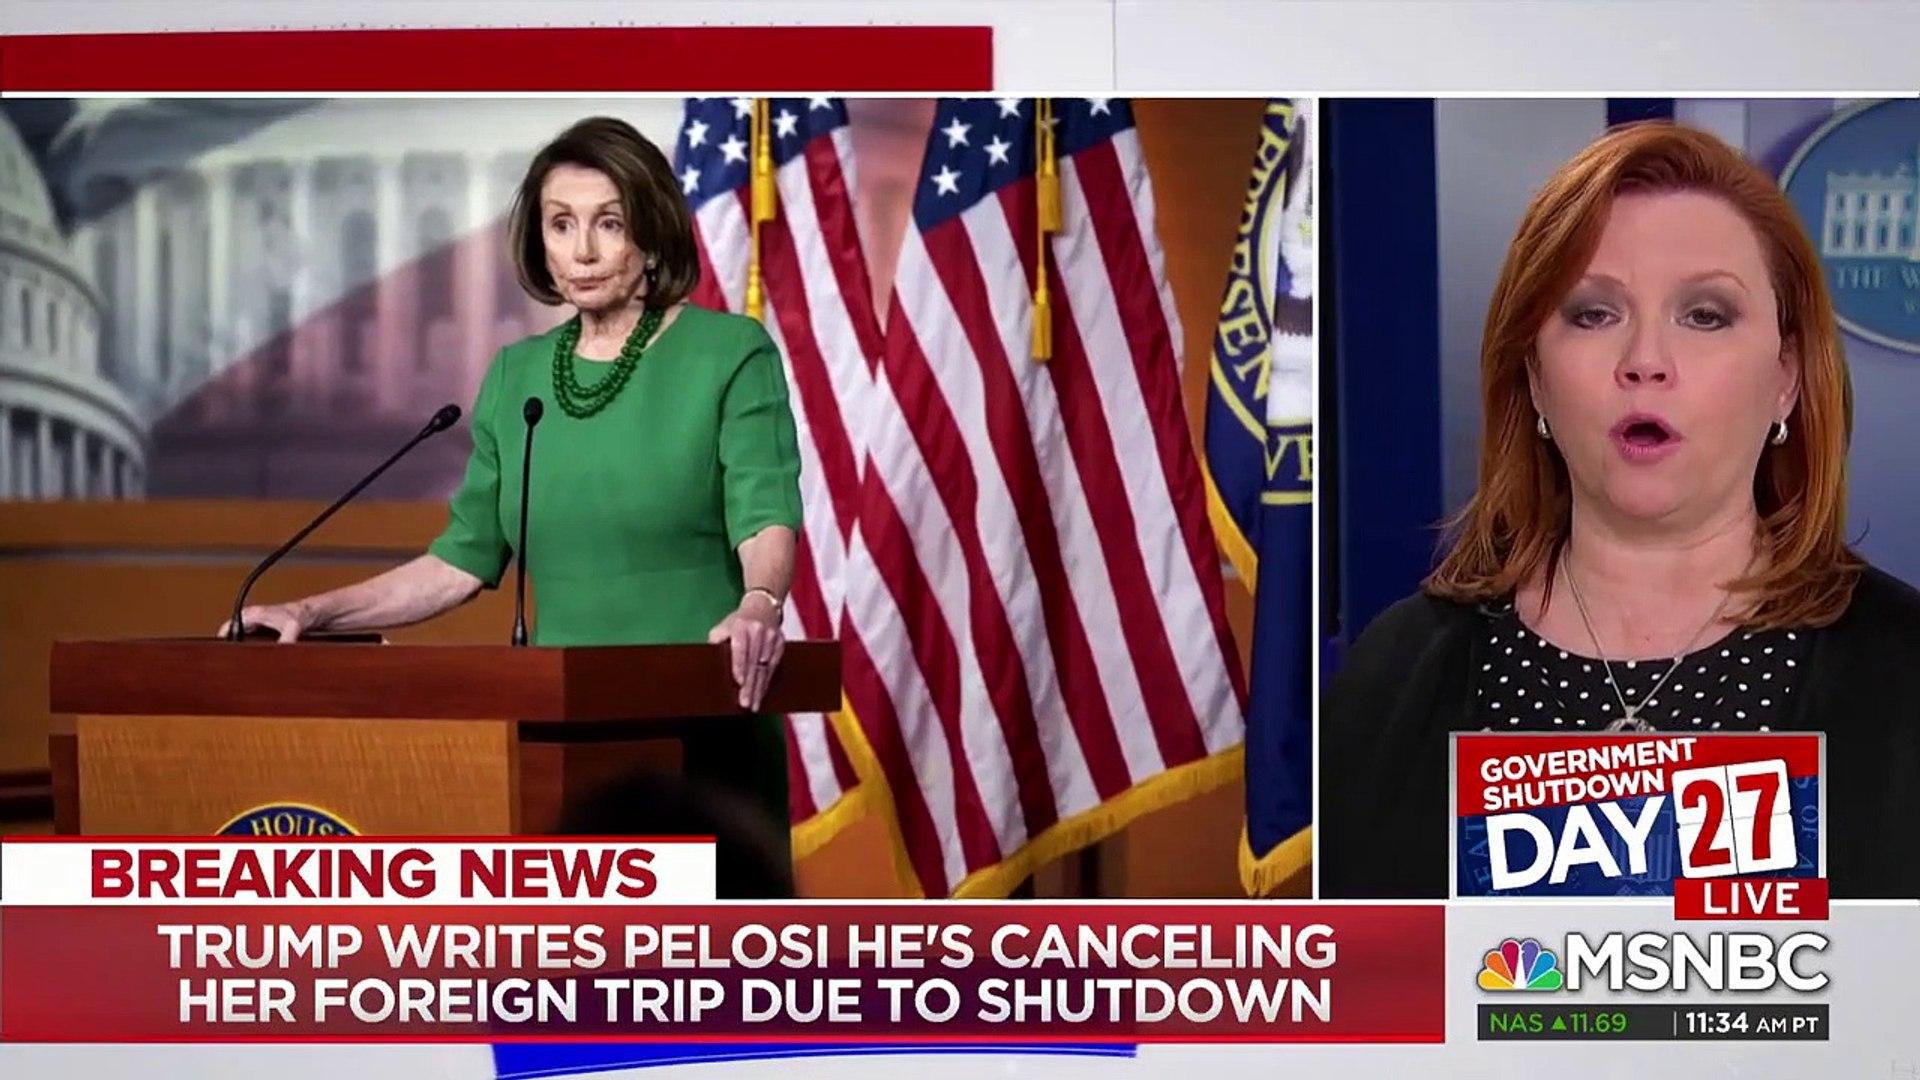 Democratic Congressman rips Trump as a 'man-baby' for retaliating against Trump